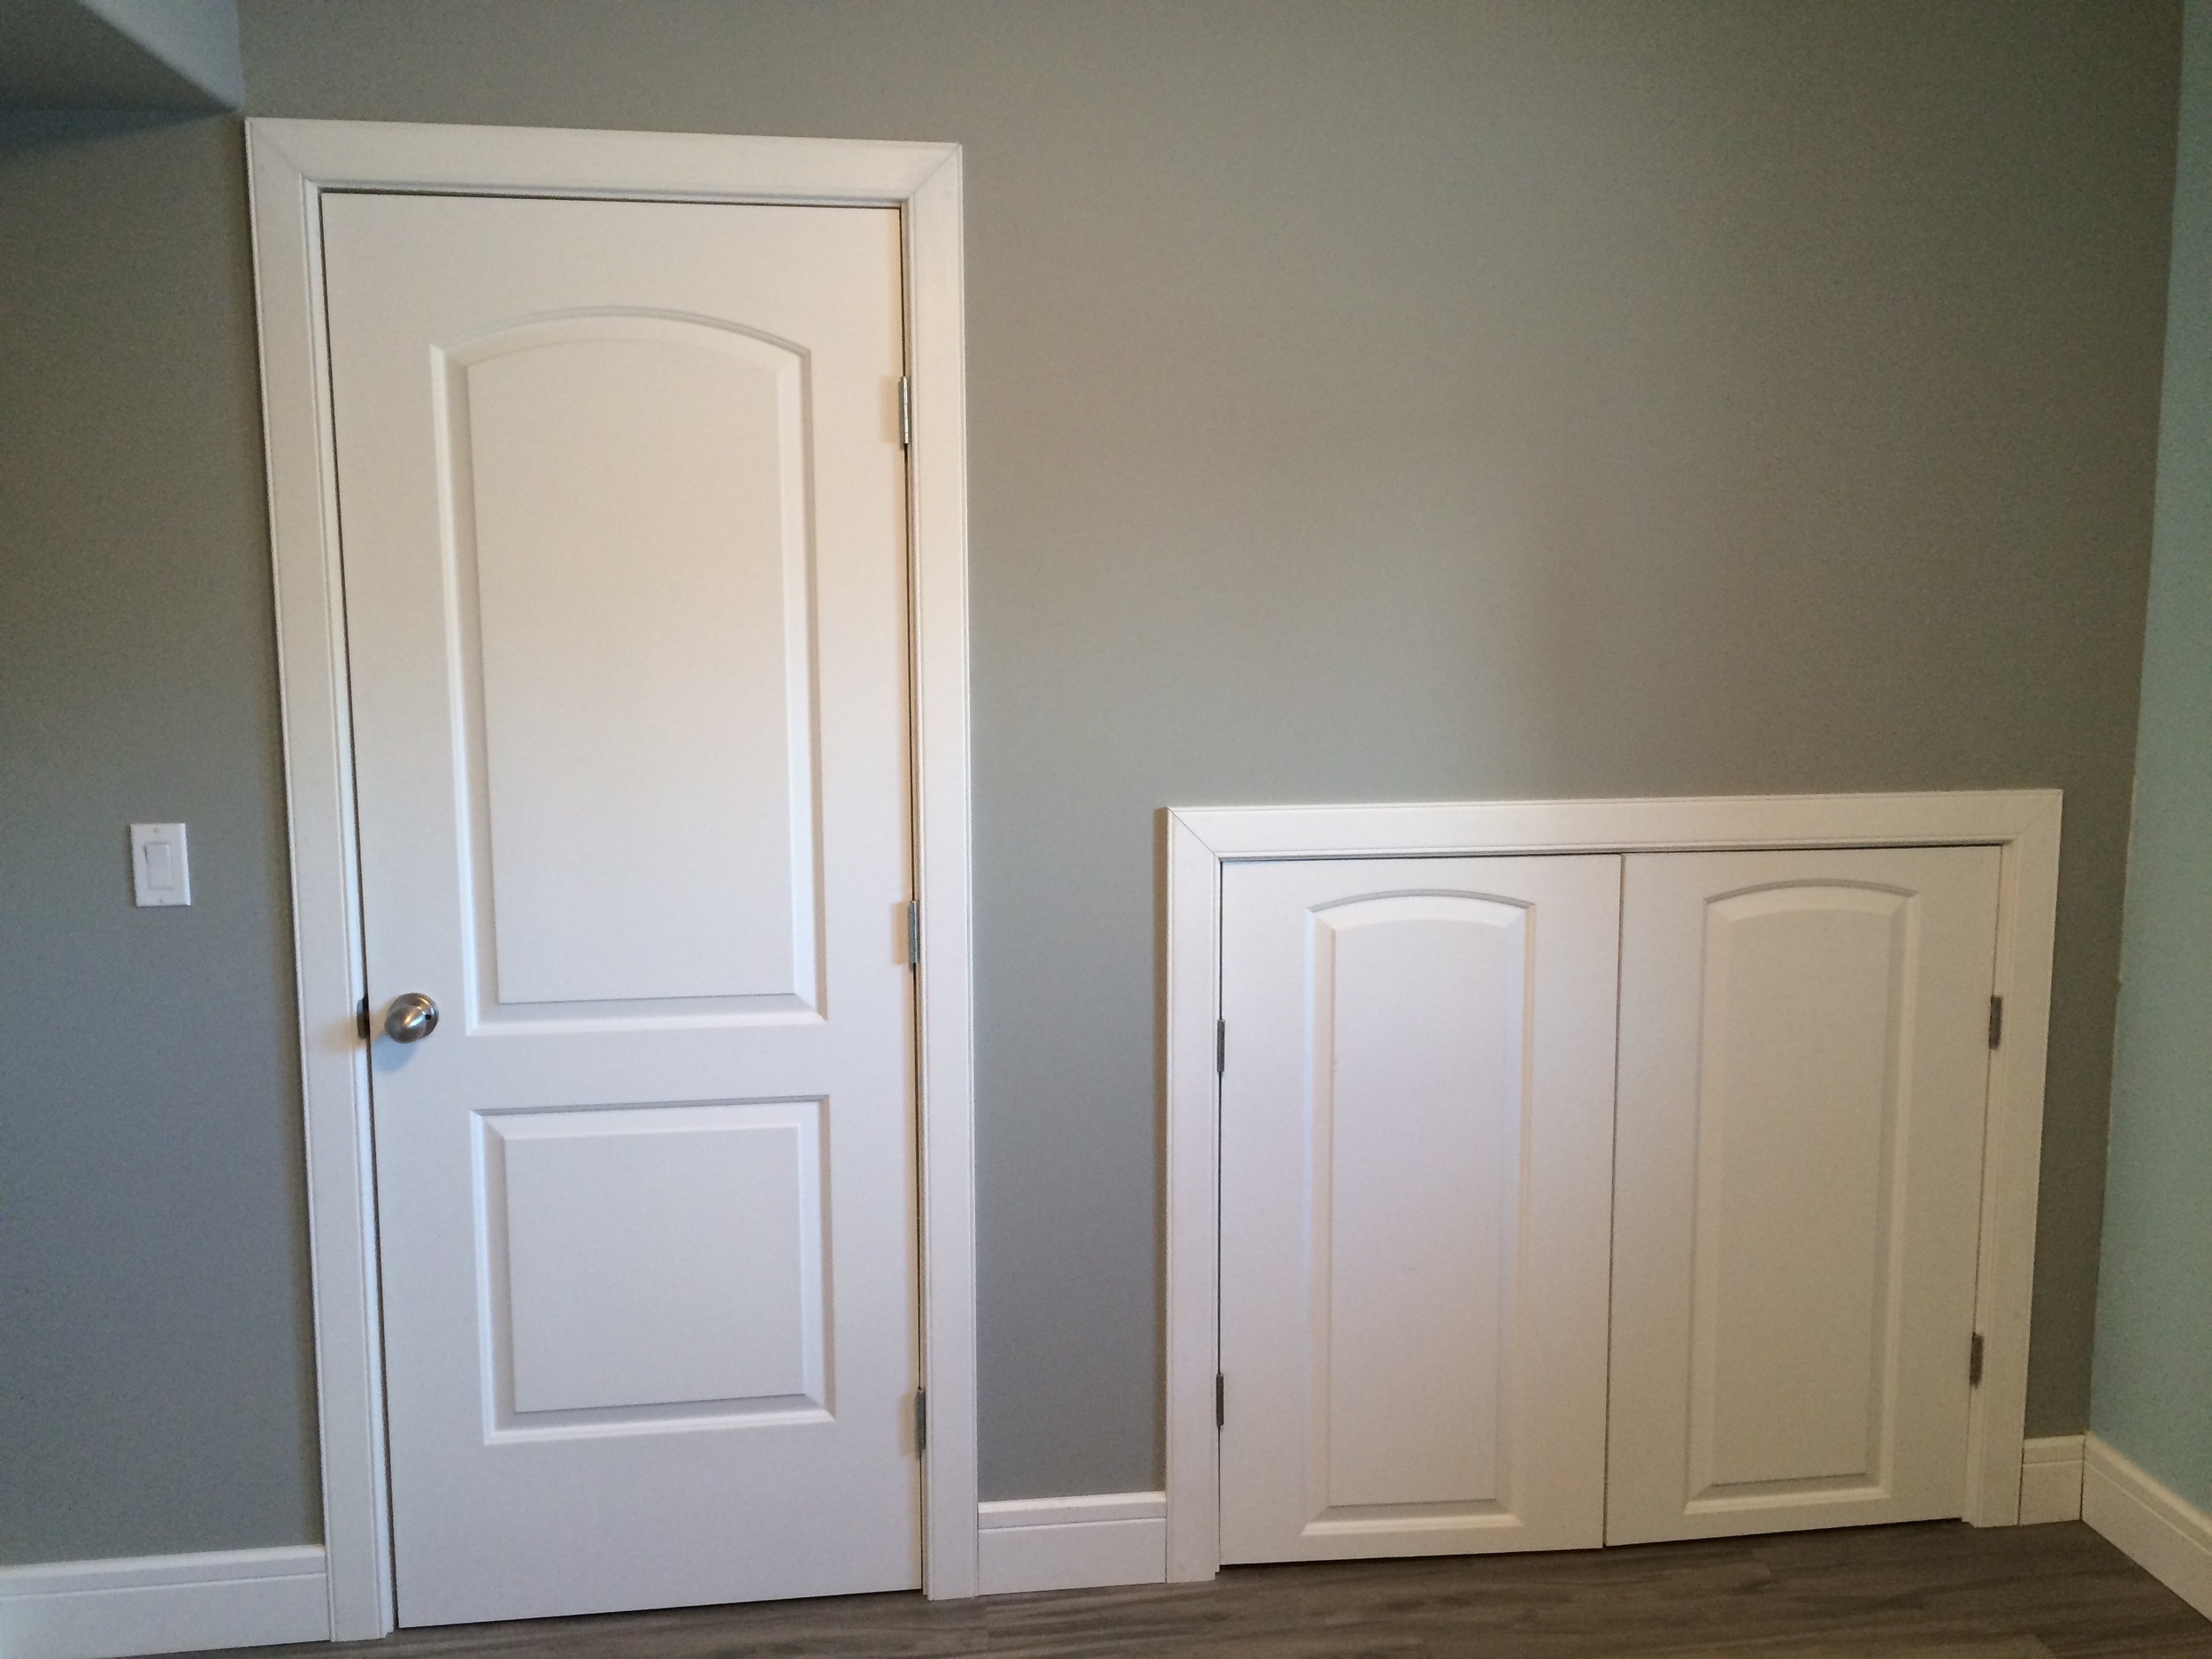 Basement renovation Saskatoon, bedroom, custom closet, french doors, flooring, trusted contractor